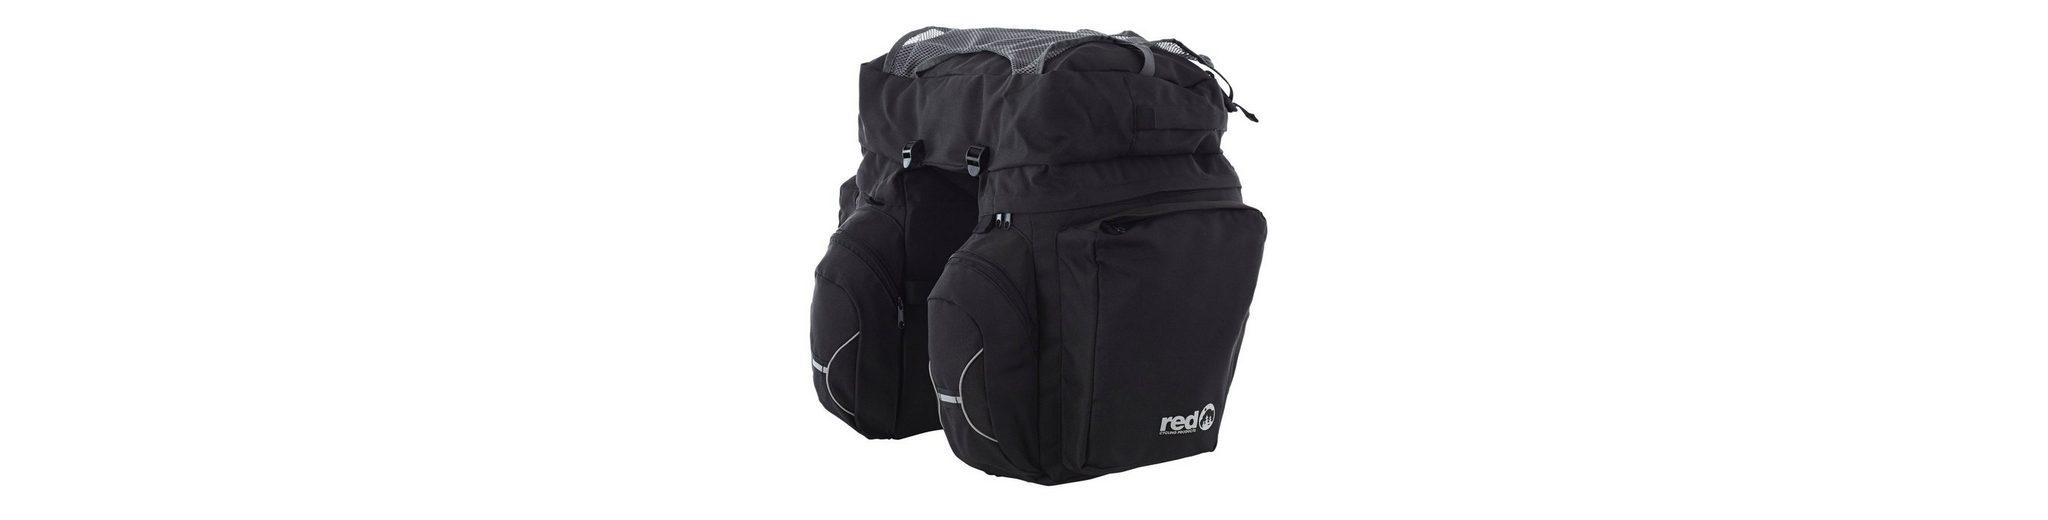 Red Cycling Products Gepäckträgertasche »Touring Set Gepäckträgertasche«